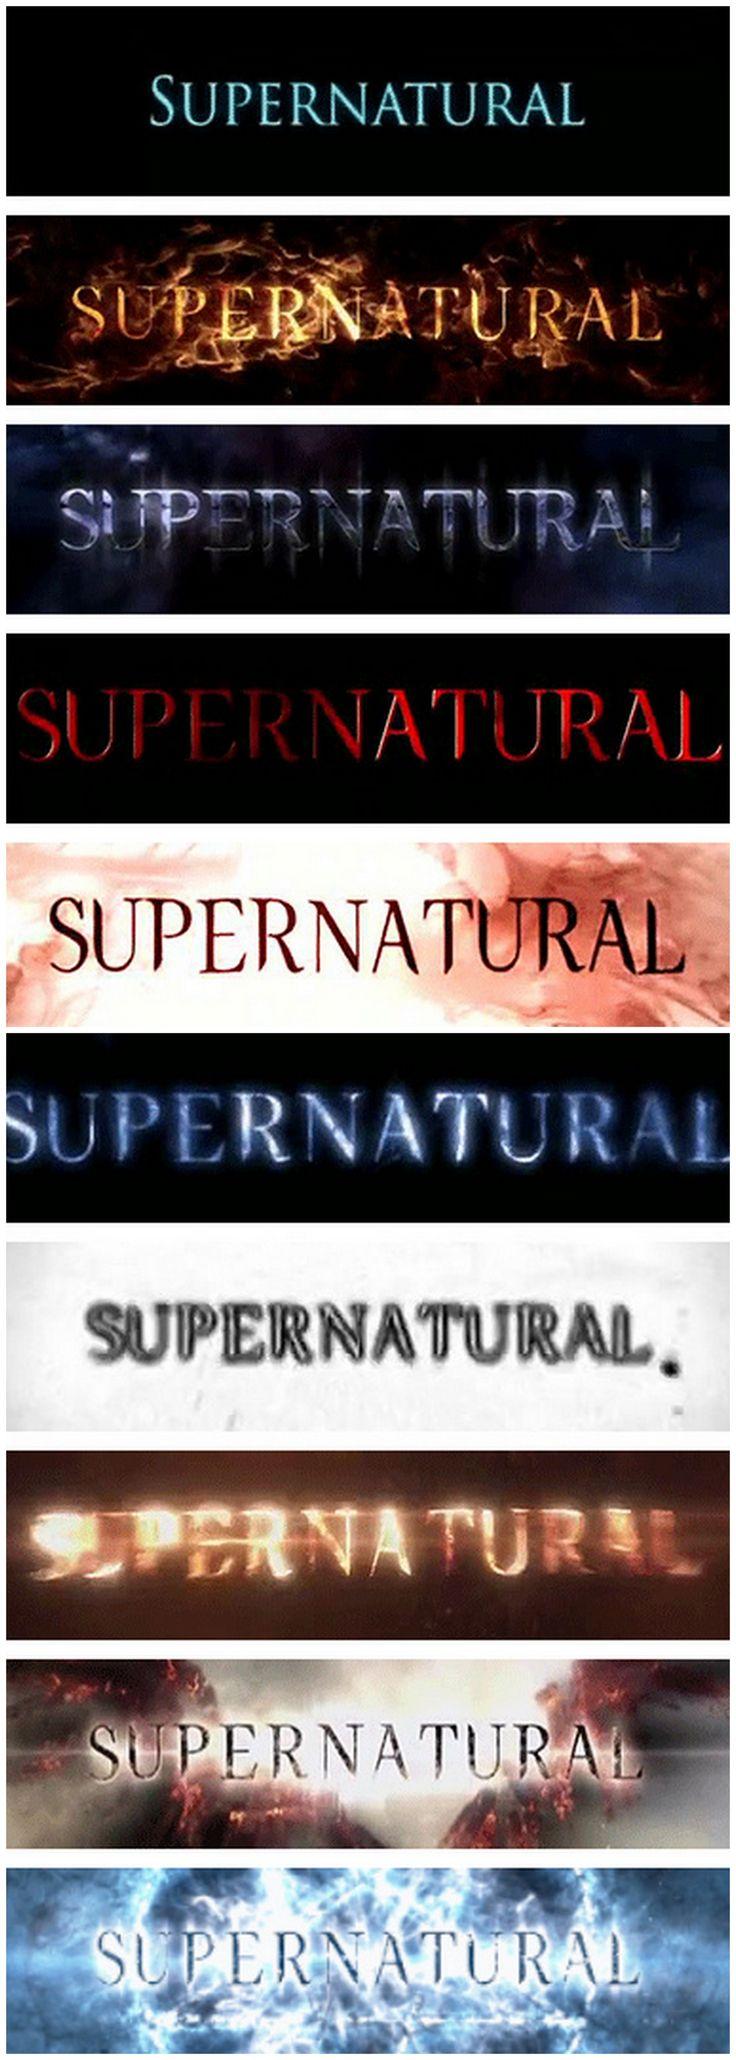 17 best ideas about supernatural tattoo on pinterest - Supernatural season 8 title card ...